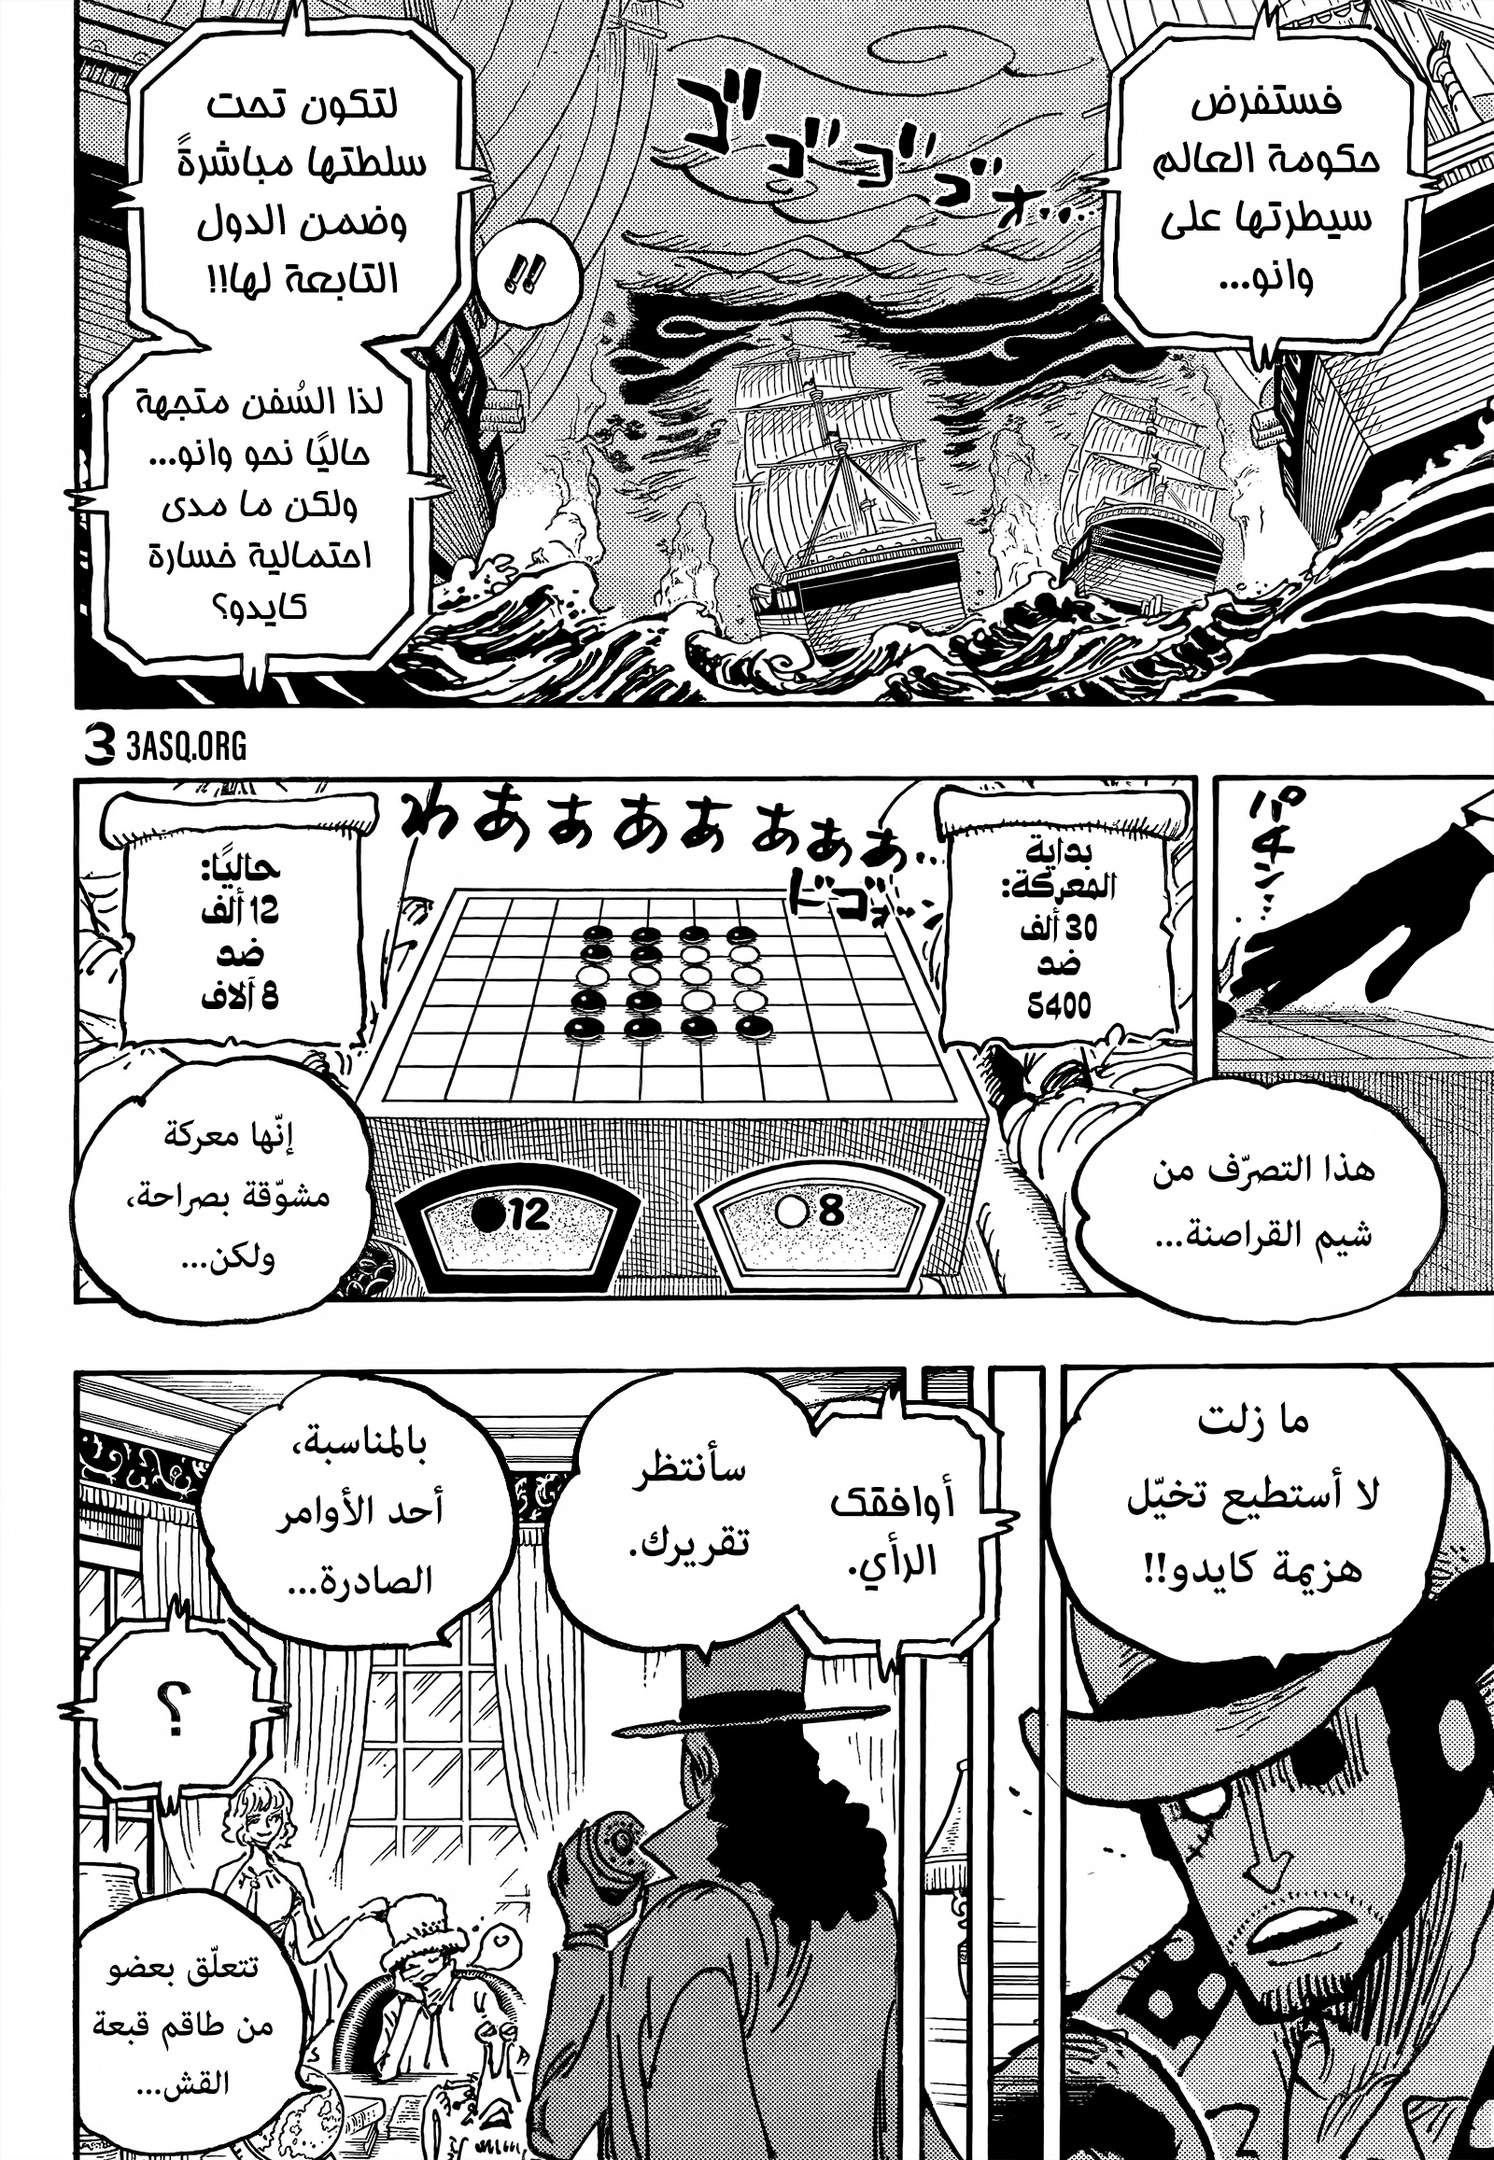 Arab One Piece 1028, image №4